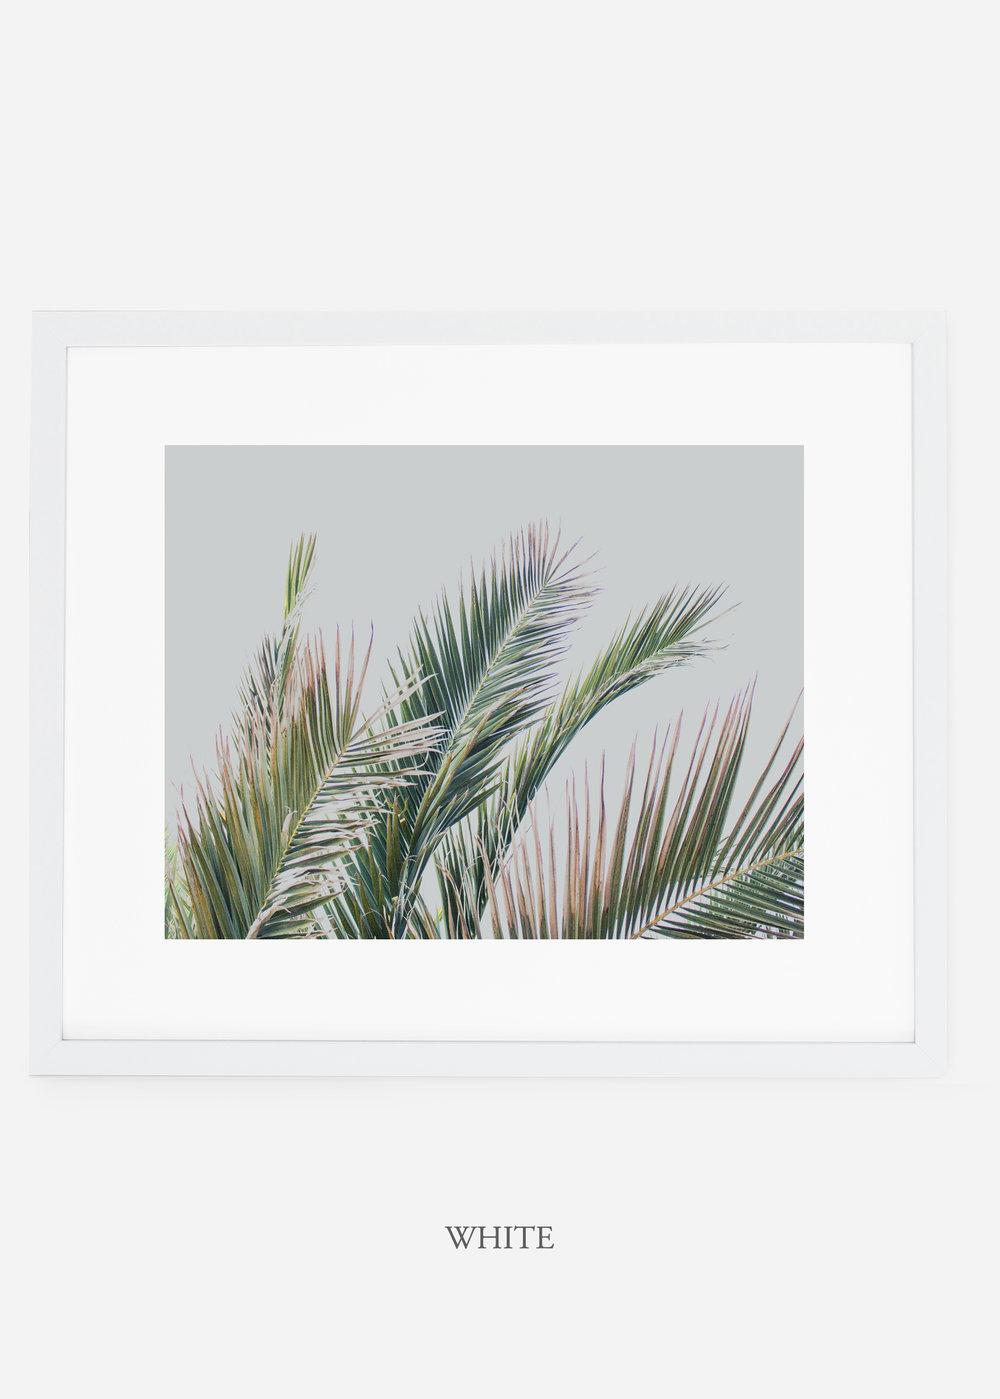 interiordesign_whiteframe_art_tropical_palmtree_StormyGrayPalm.jpg